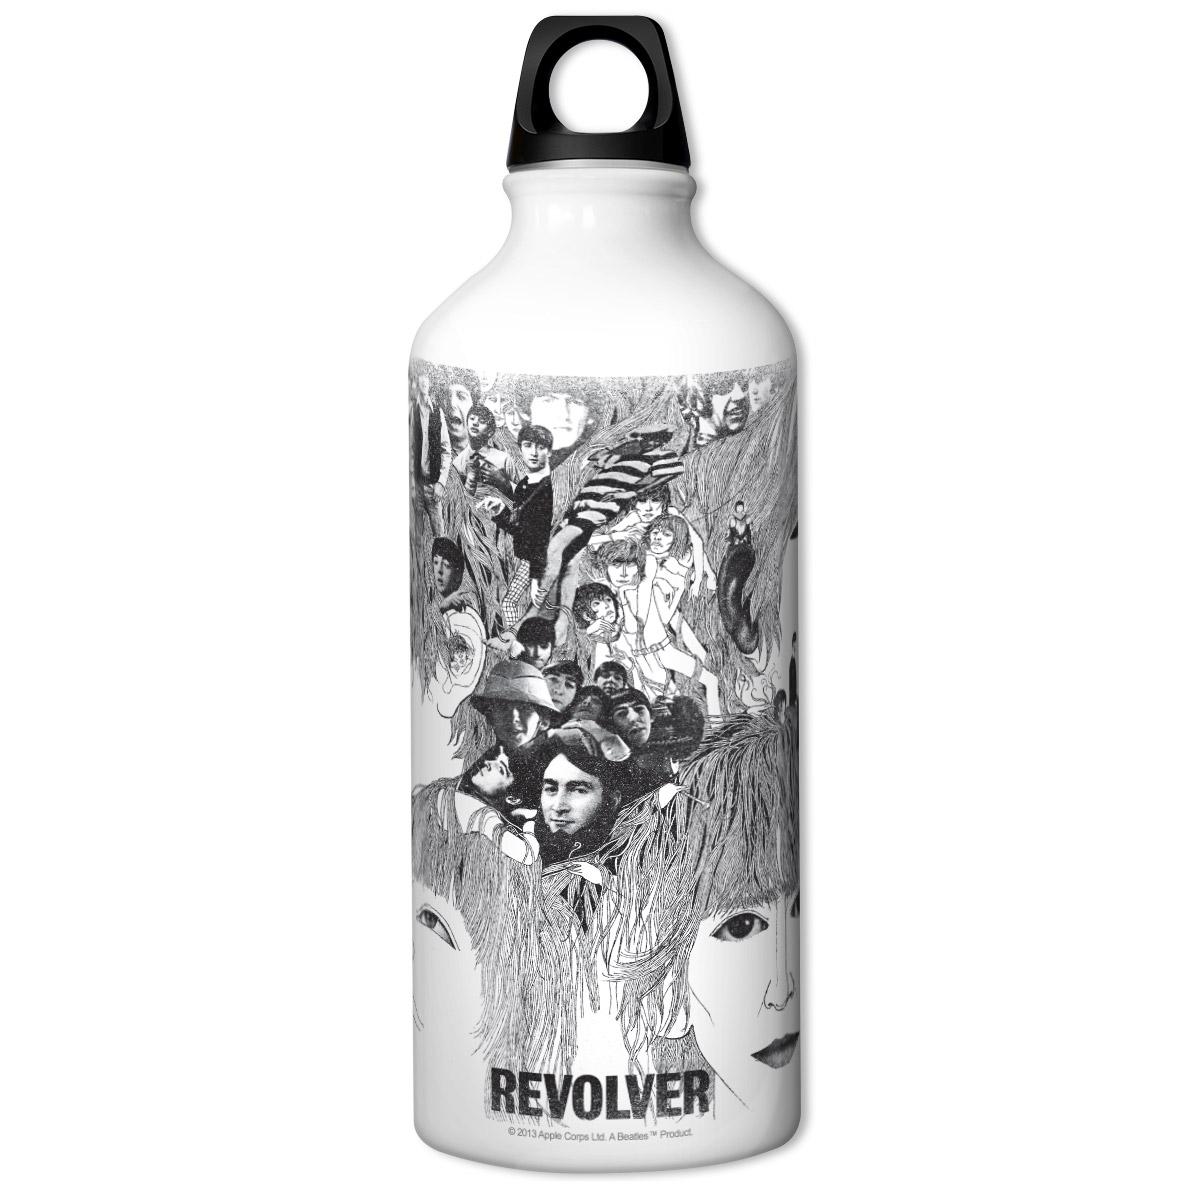 Squeeze The Beatles - Revolver